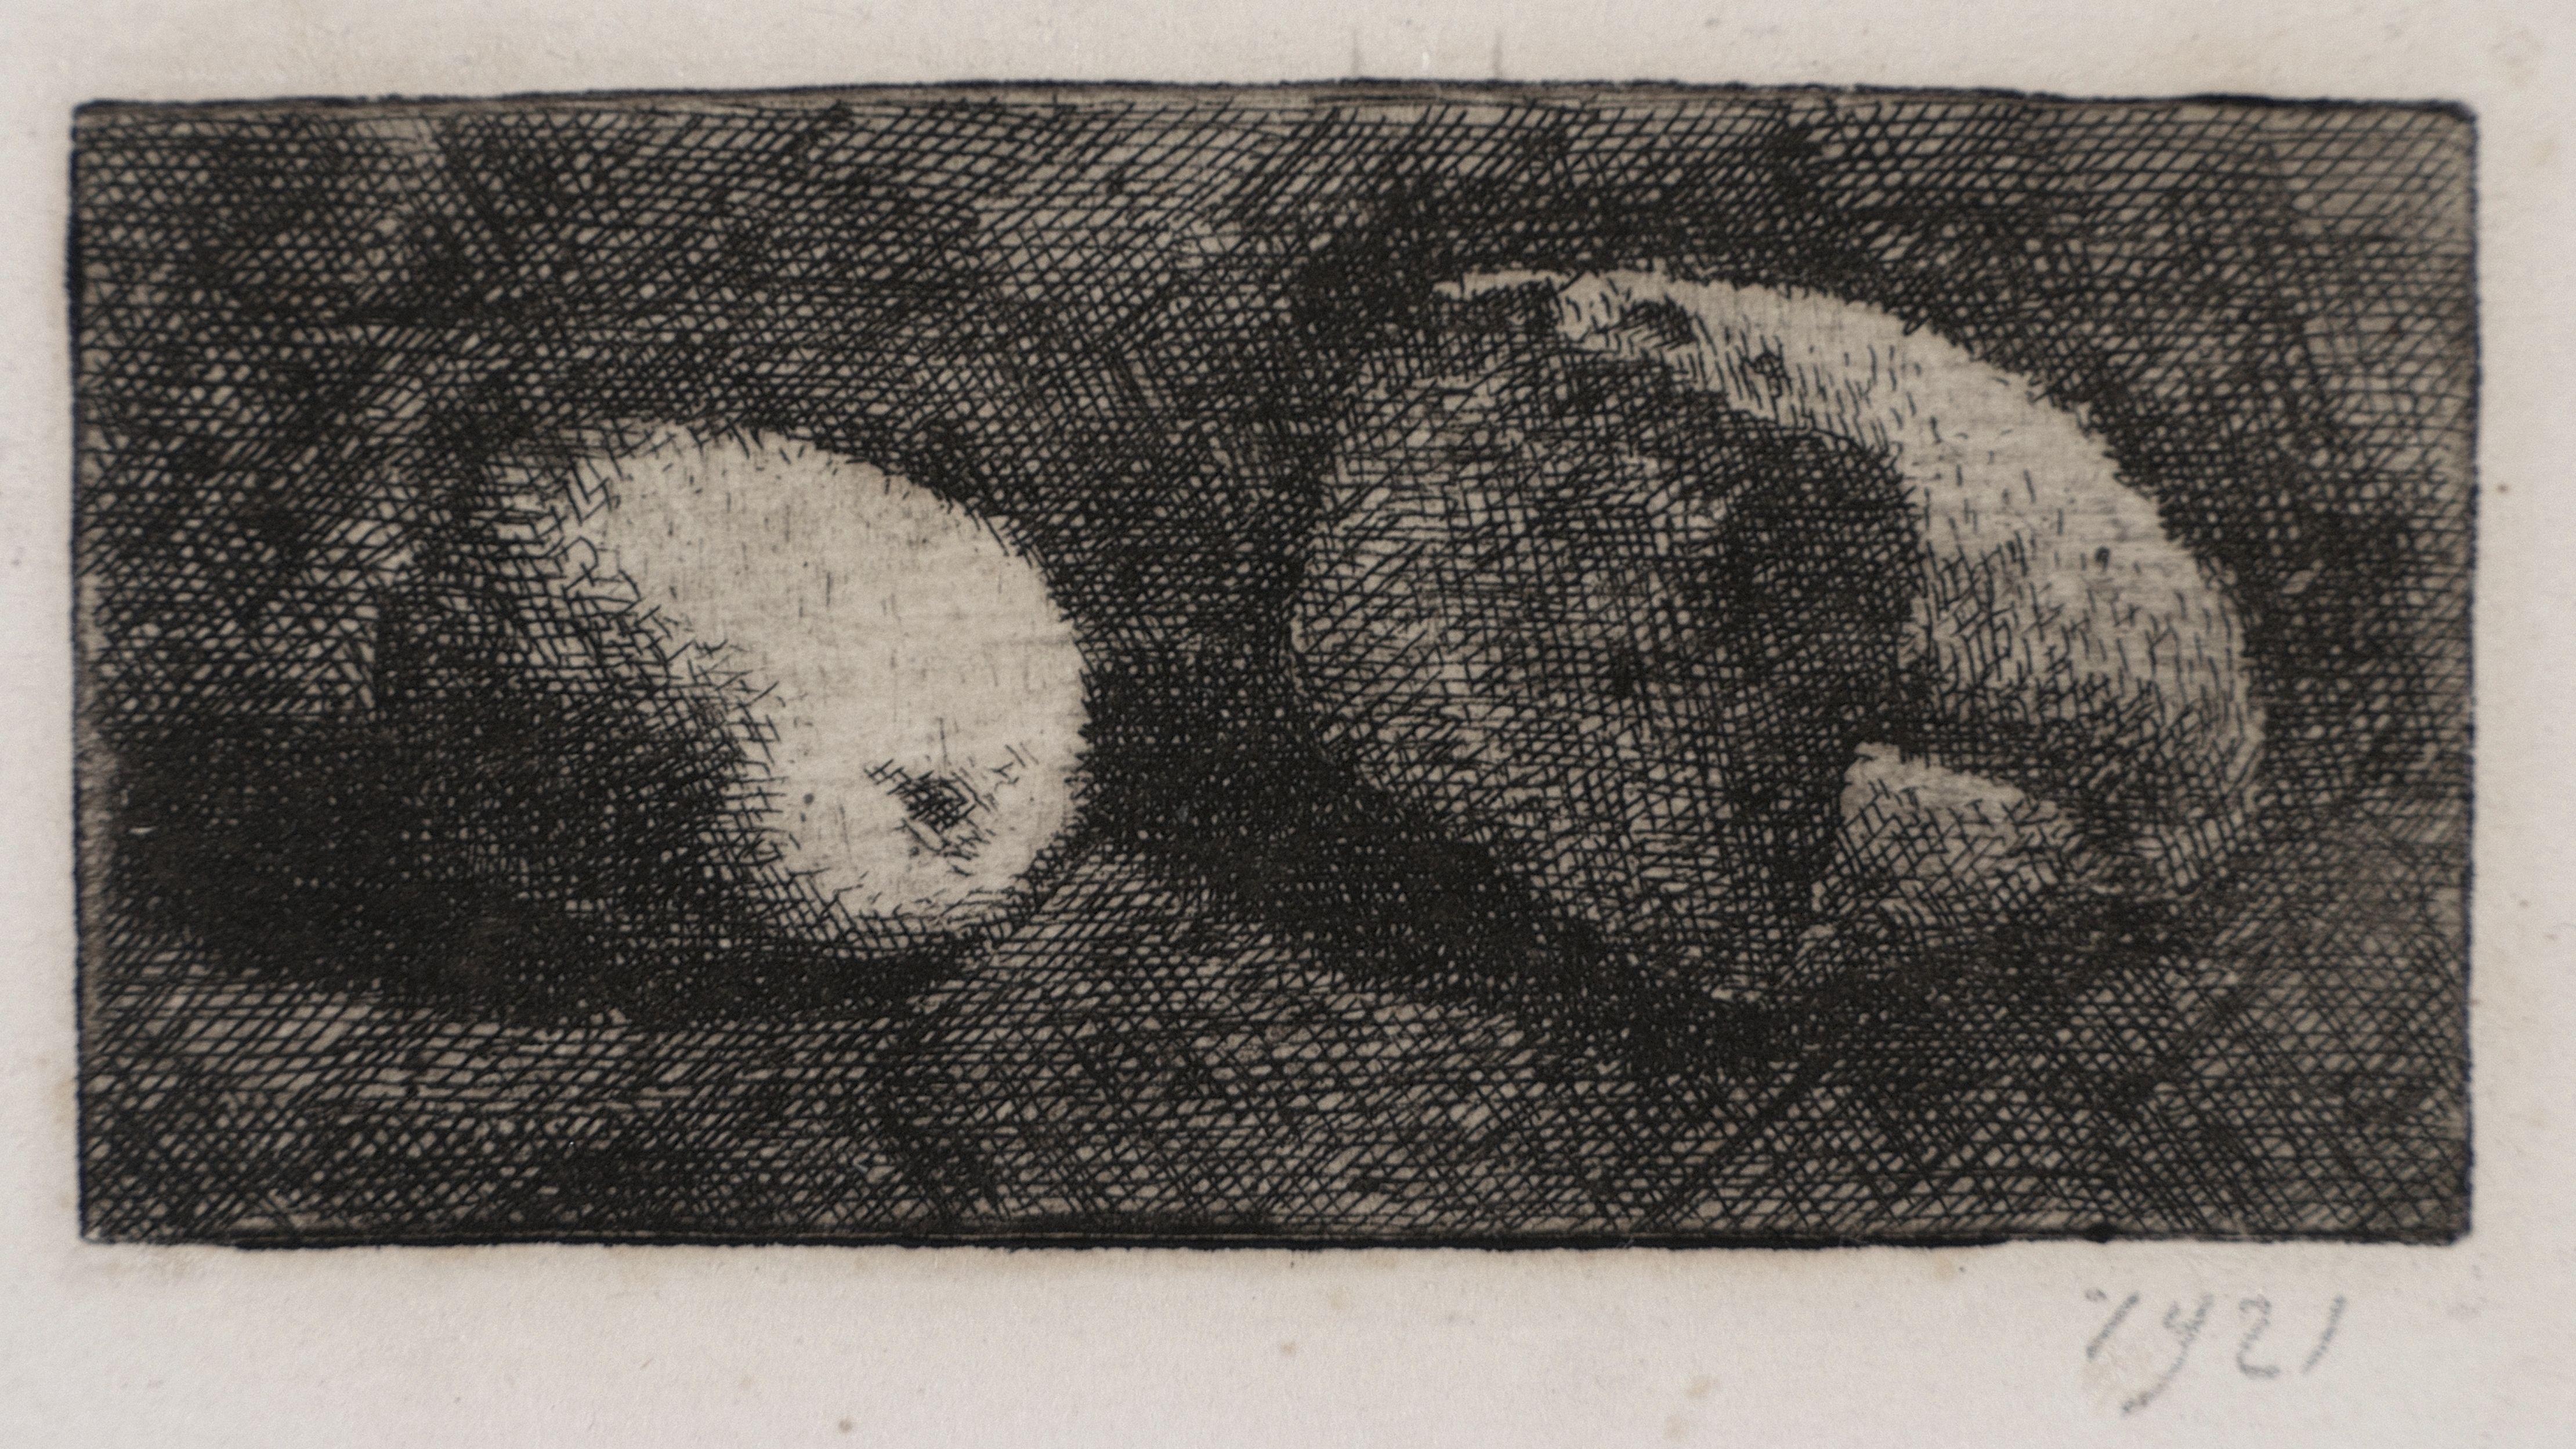 Giorgio Morandi  Natura morta con pane e limone, 1921 (V.inc.13)  acquaforte su rame